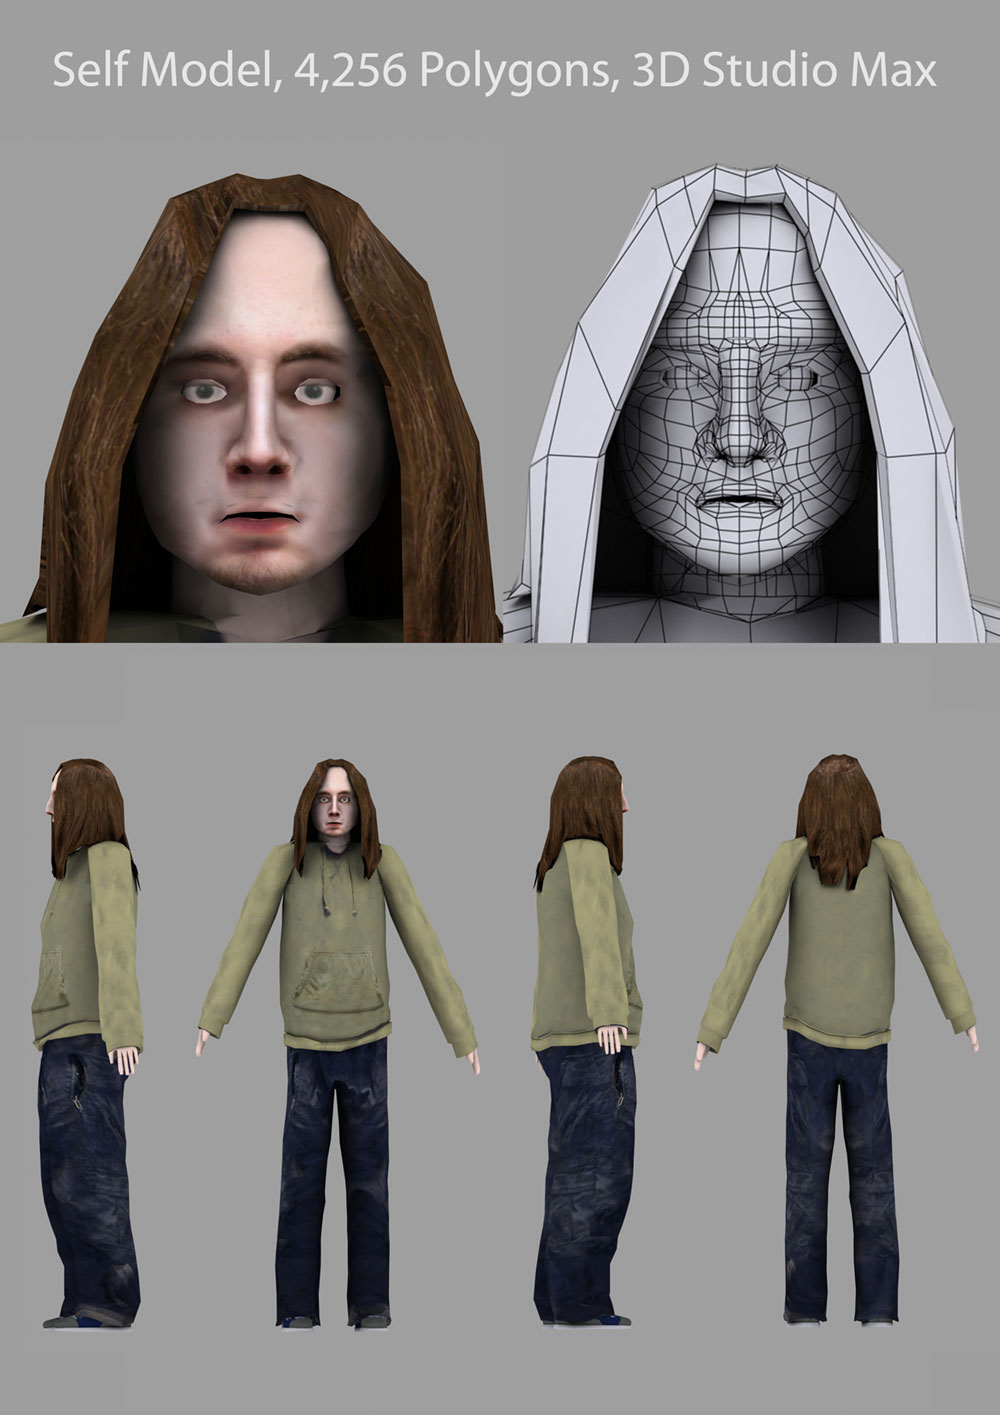 3D Self Model